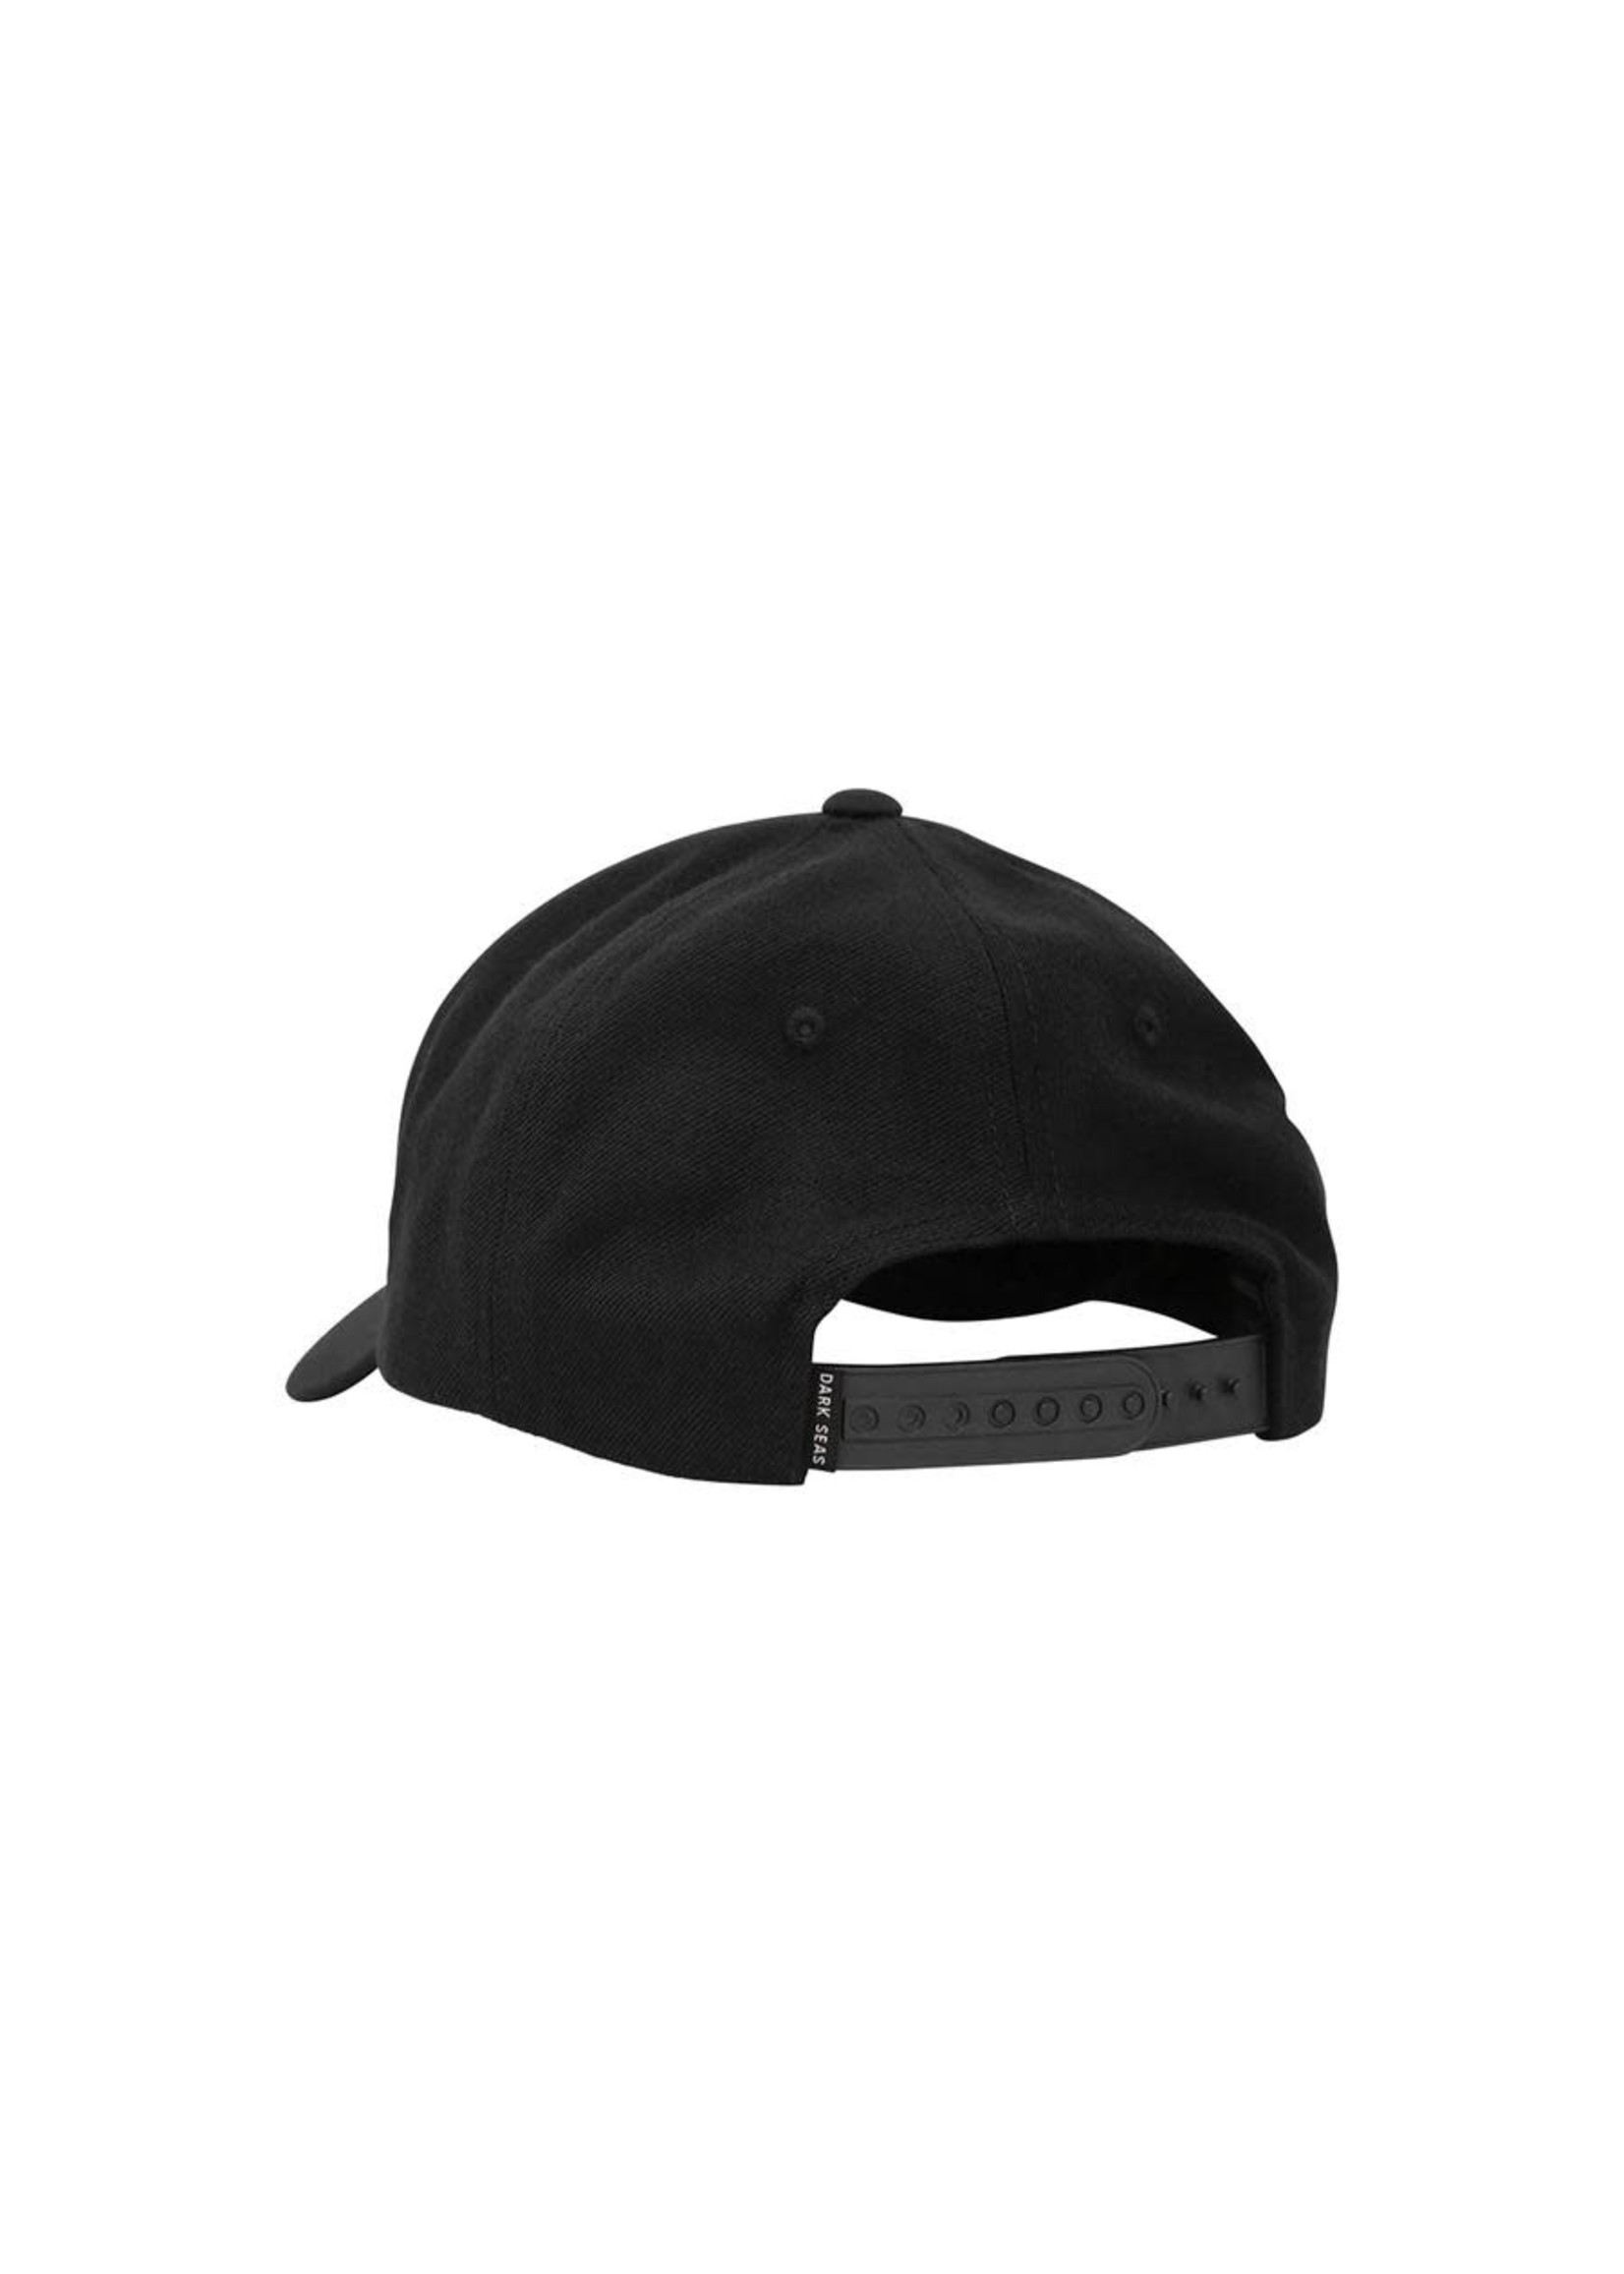 Dark Seas Dark Seas Patrick Snapback Hat